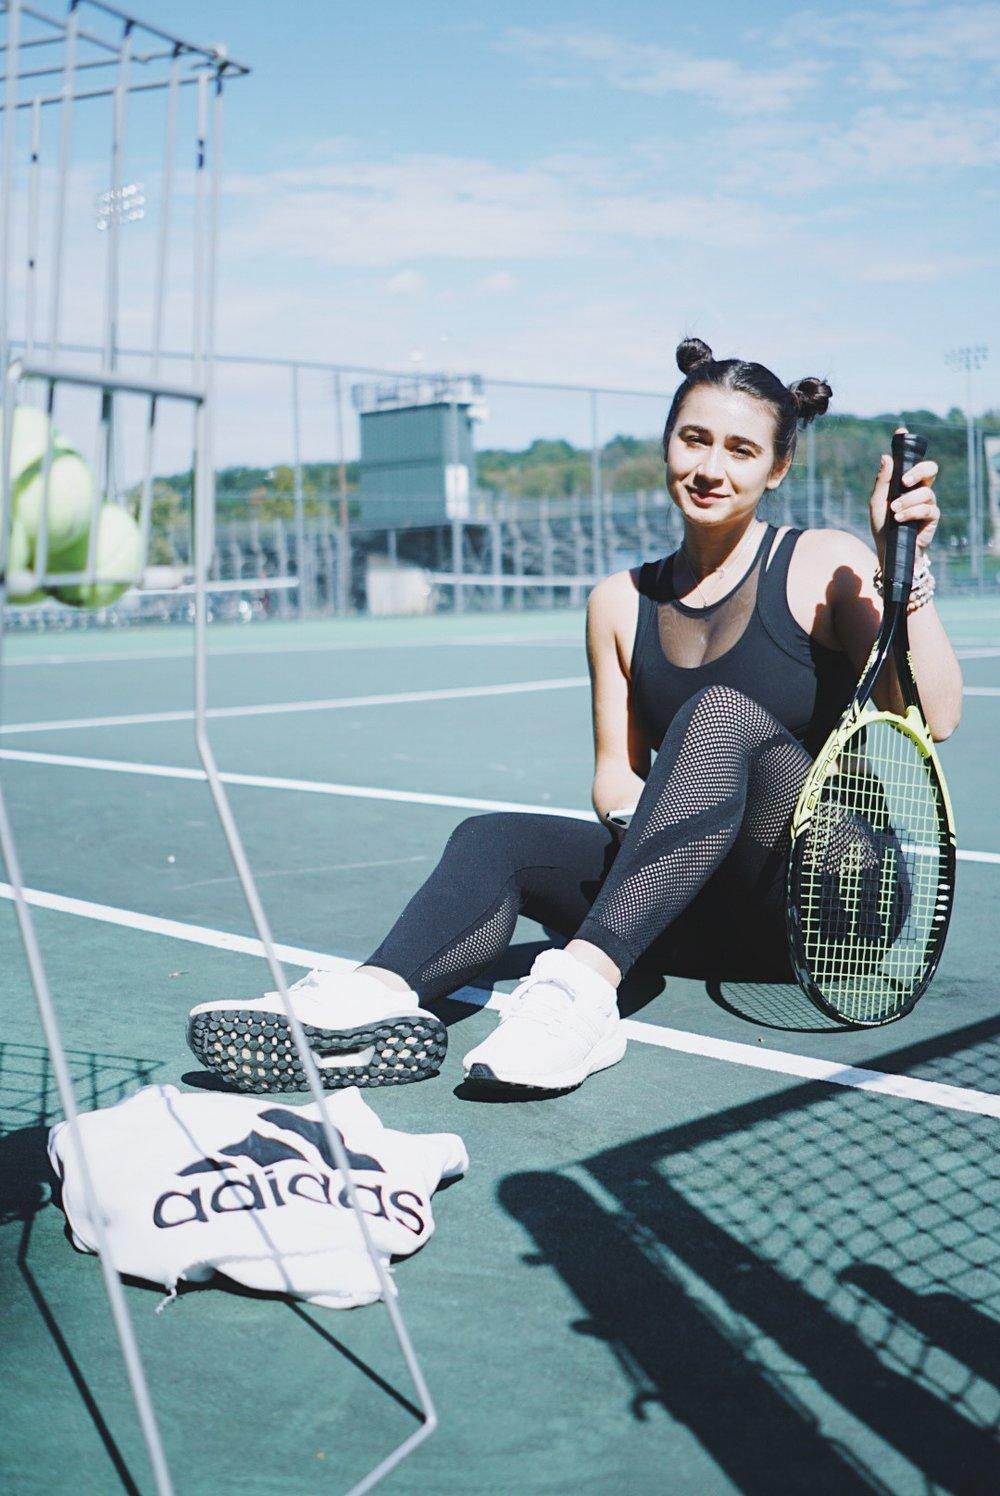 adidas women fitness model adidas running tennis athleisure lululemon sports bra leggings